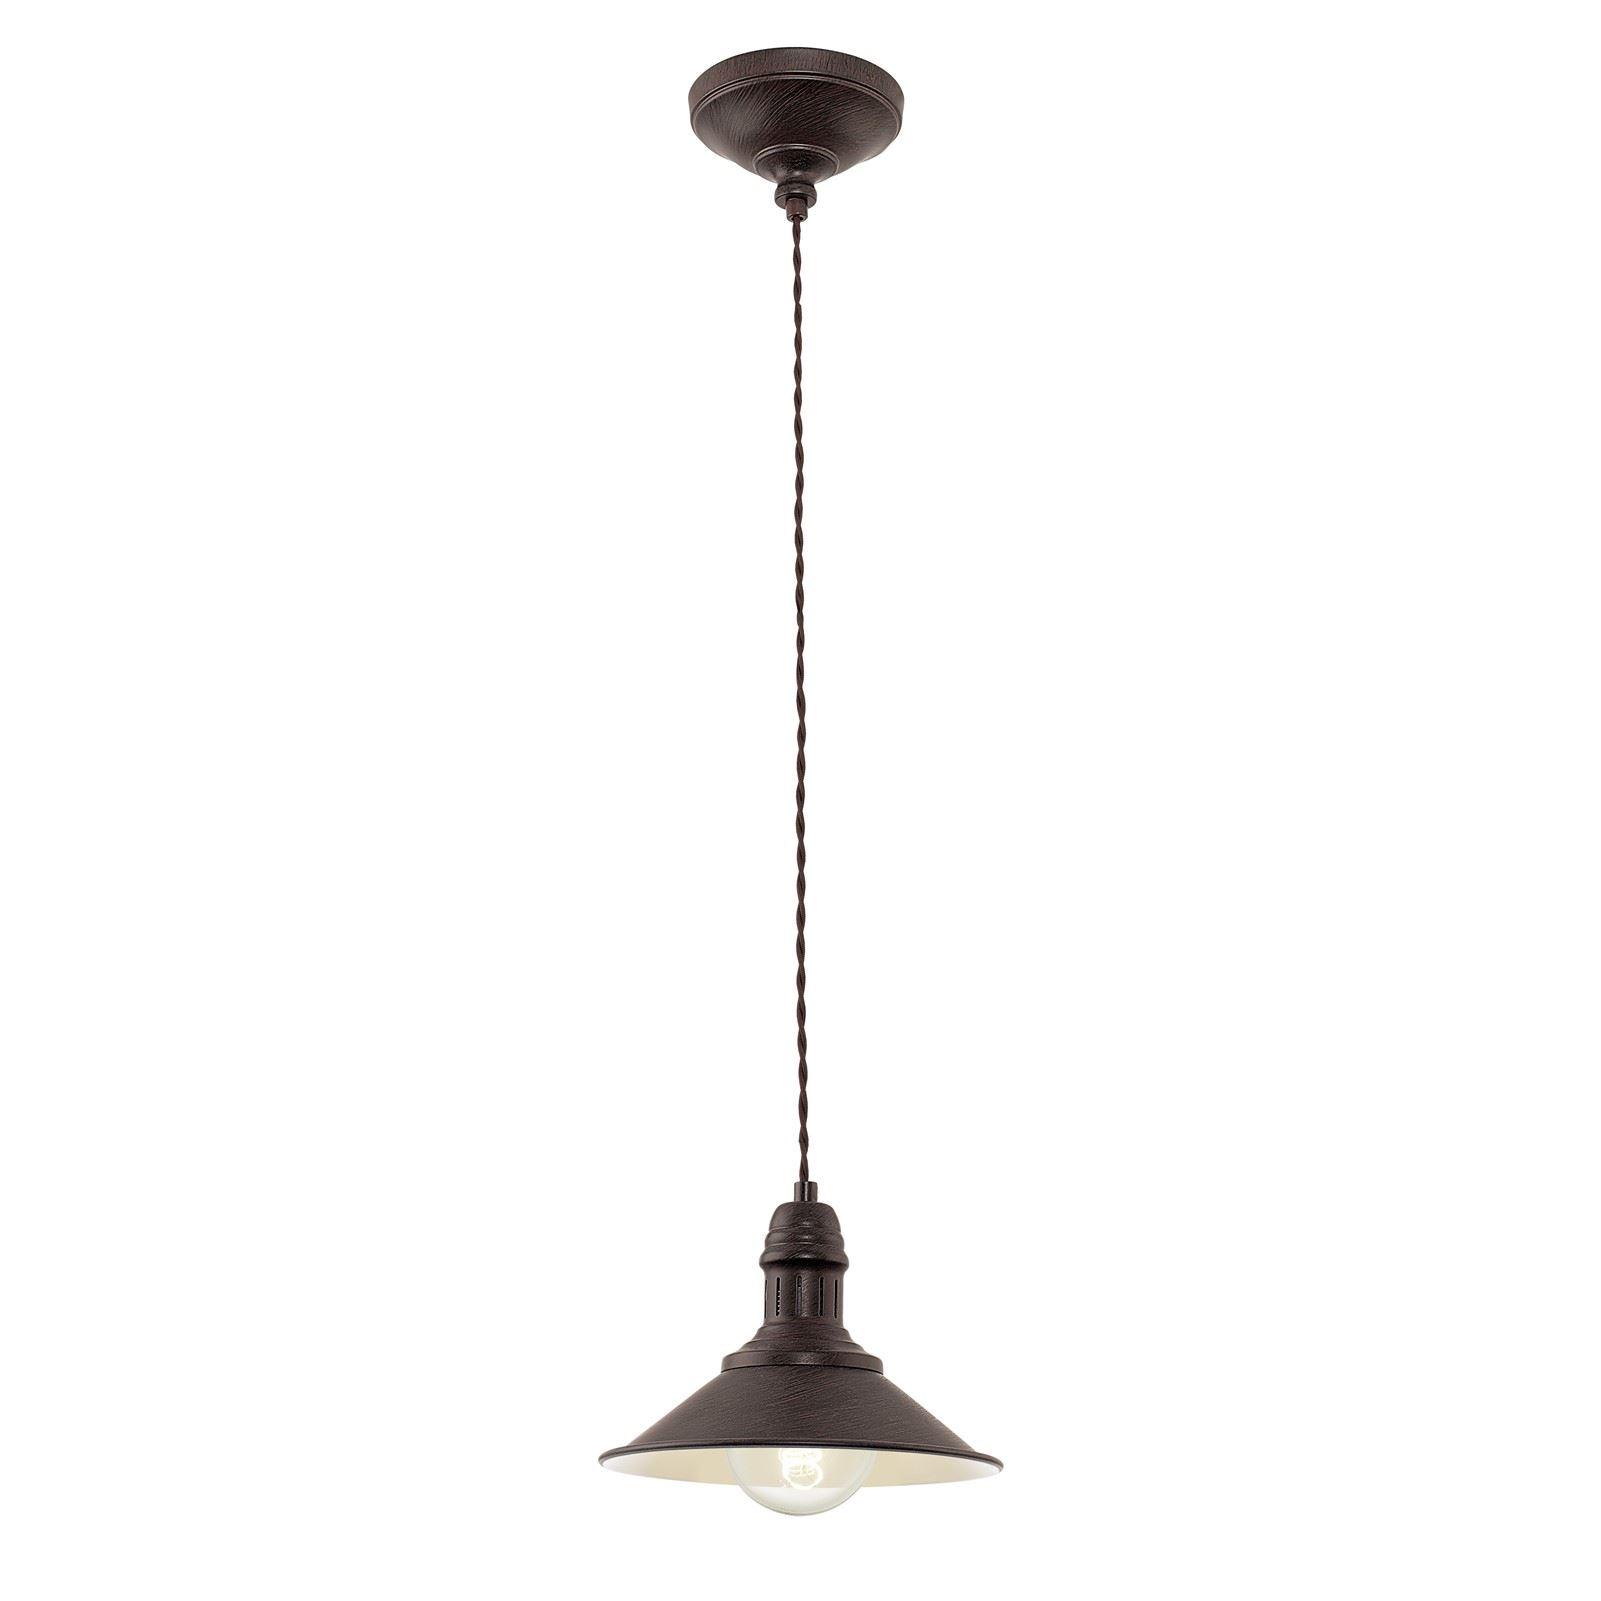 Stockbury Hanging Lamp E27 Antique-Brown-Beige Diameter 210 Mm